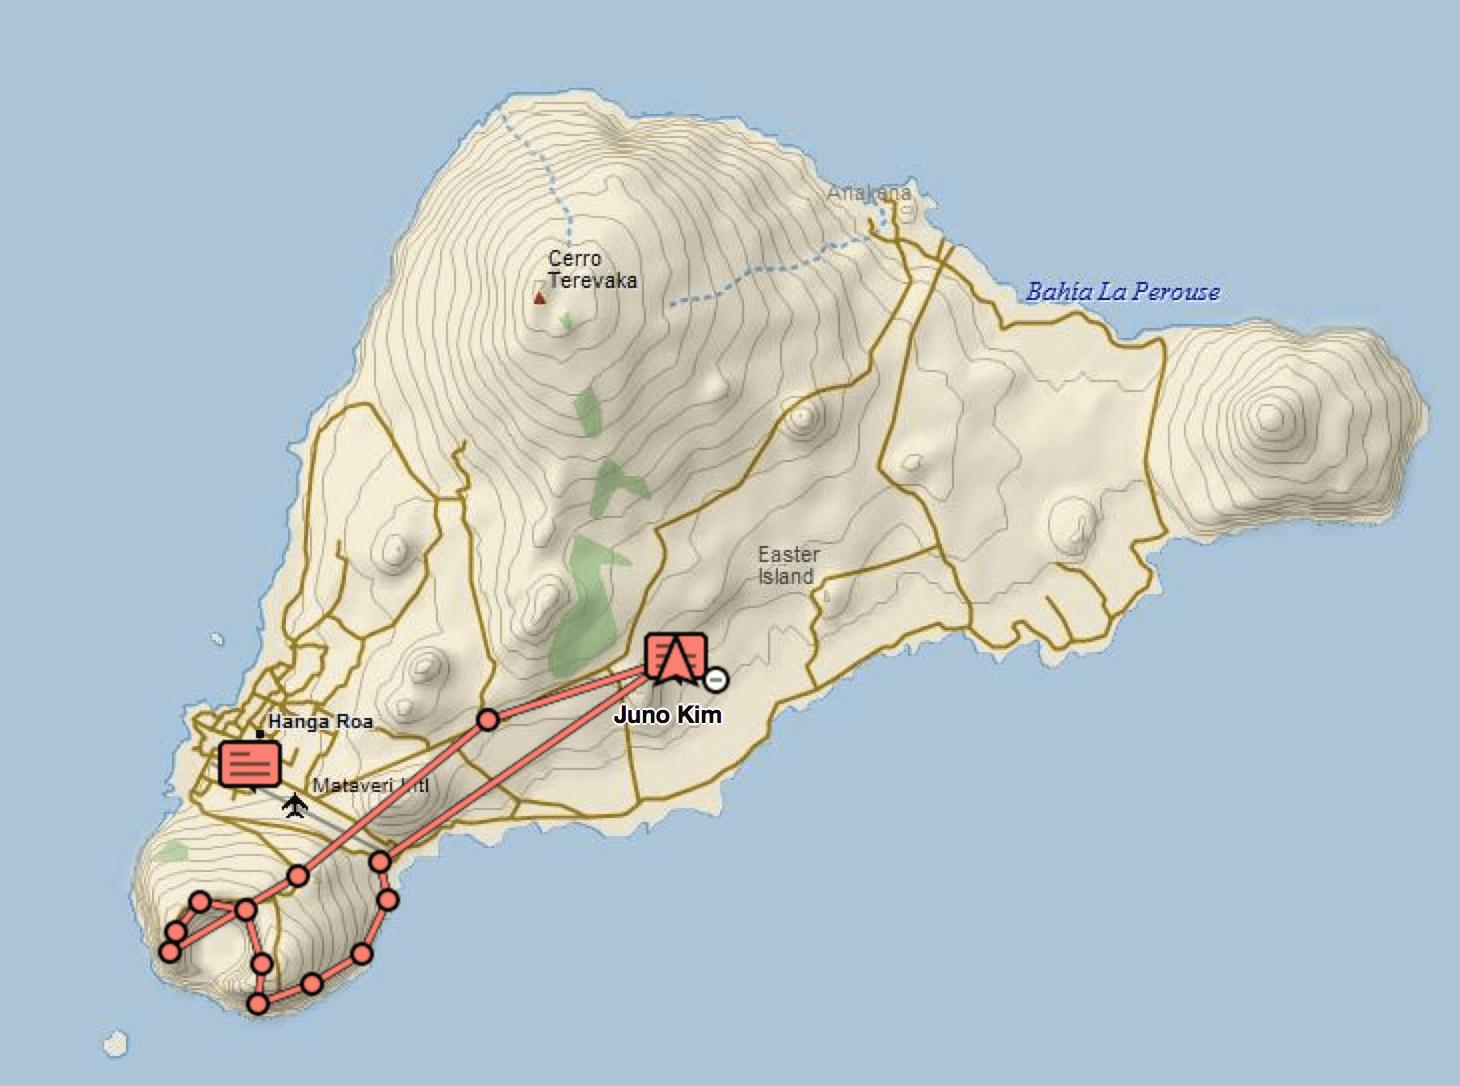 Rano Kau Hikig Trail - tracked by my InReach GPS by DeLorme